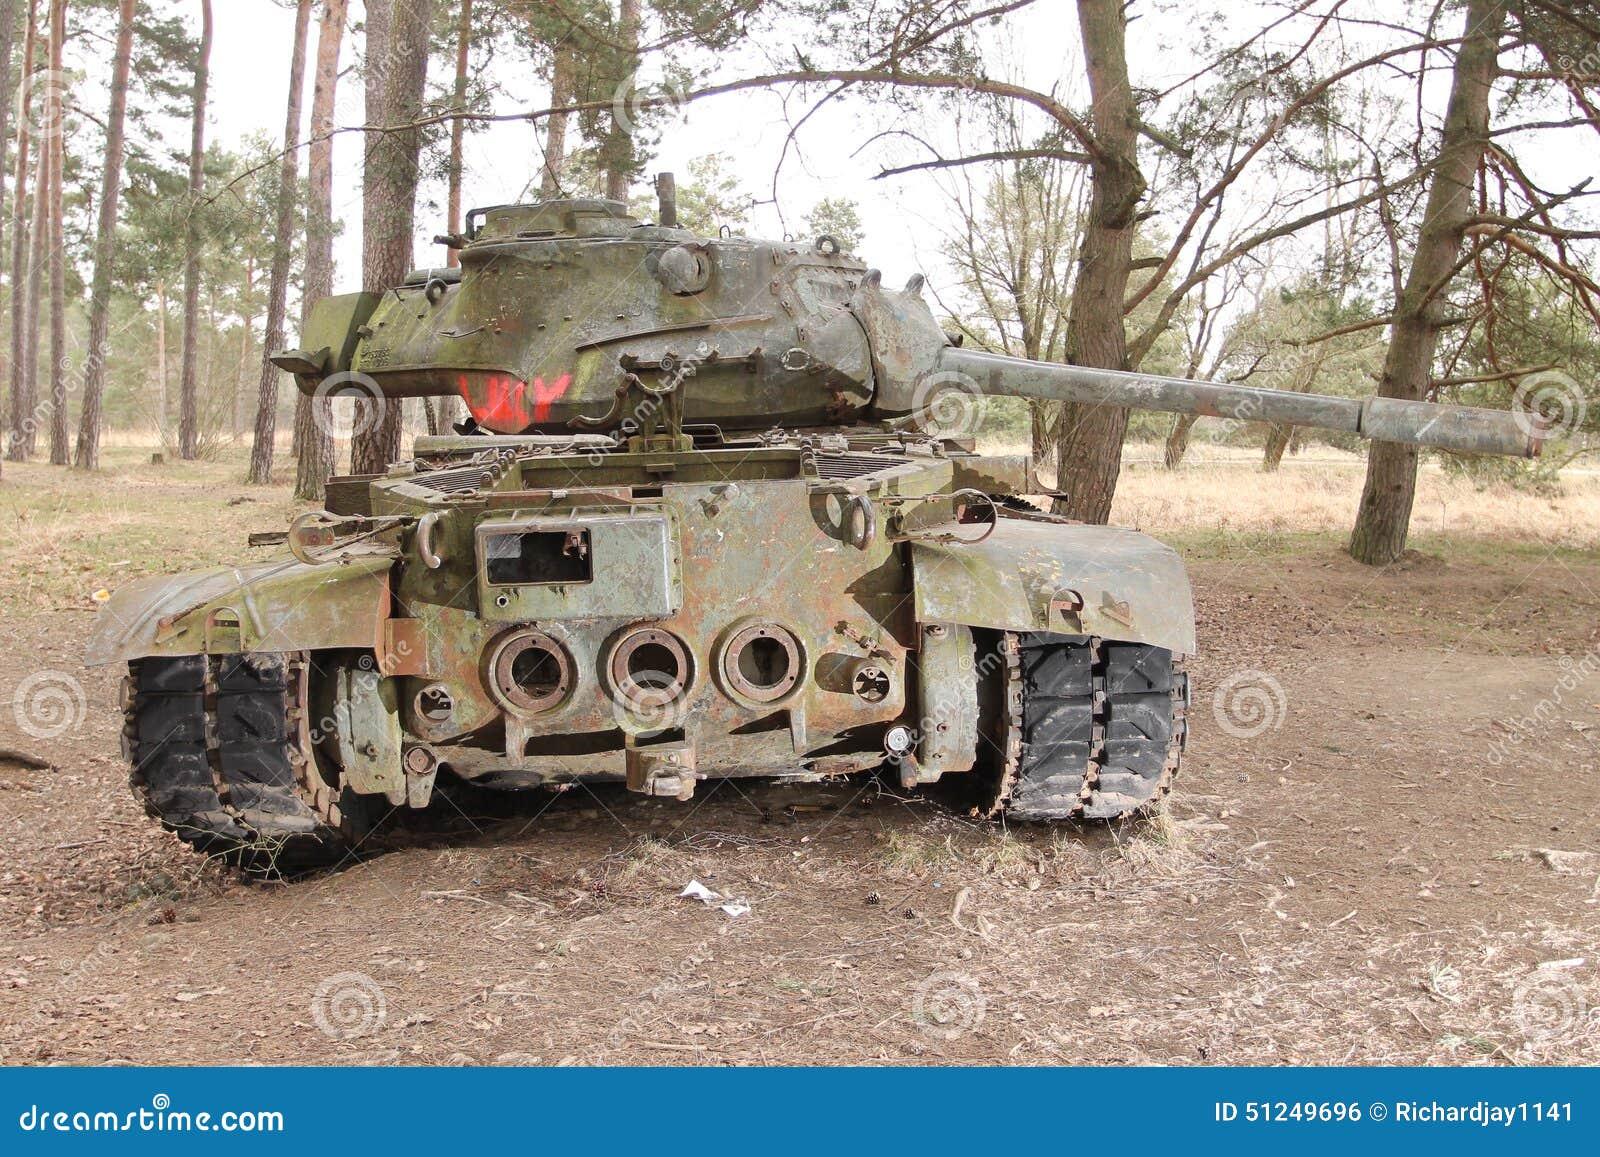 Vintage Military Equipment 61